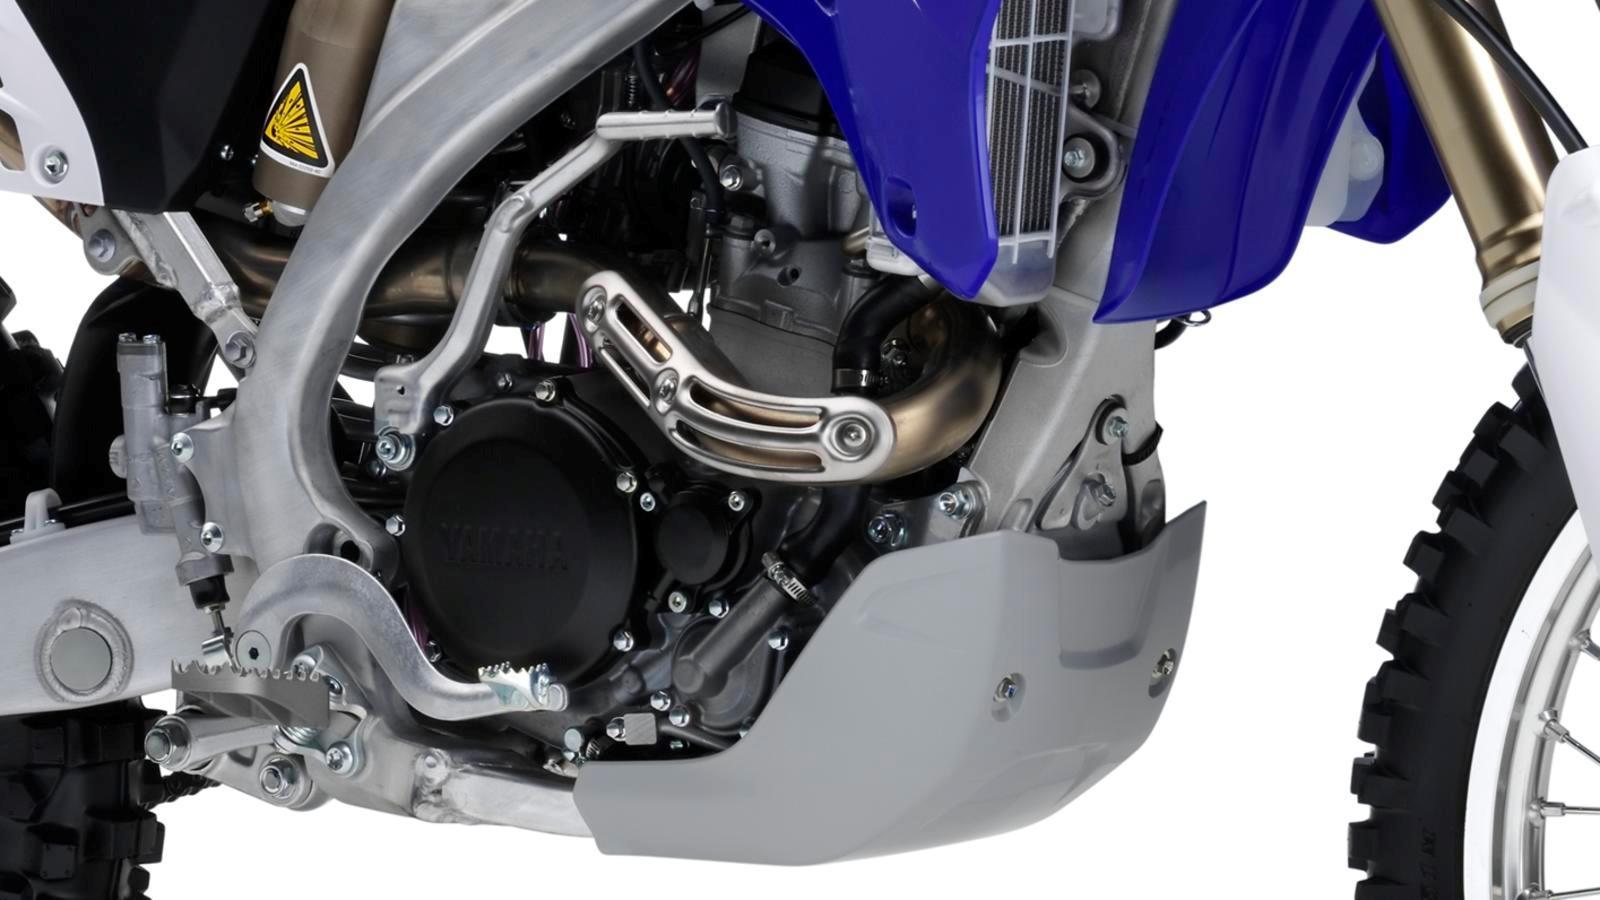 WR250F-EU-Racing-Blue-Detail-005_osob